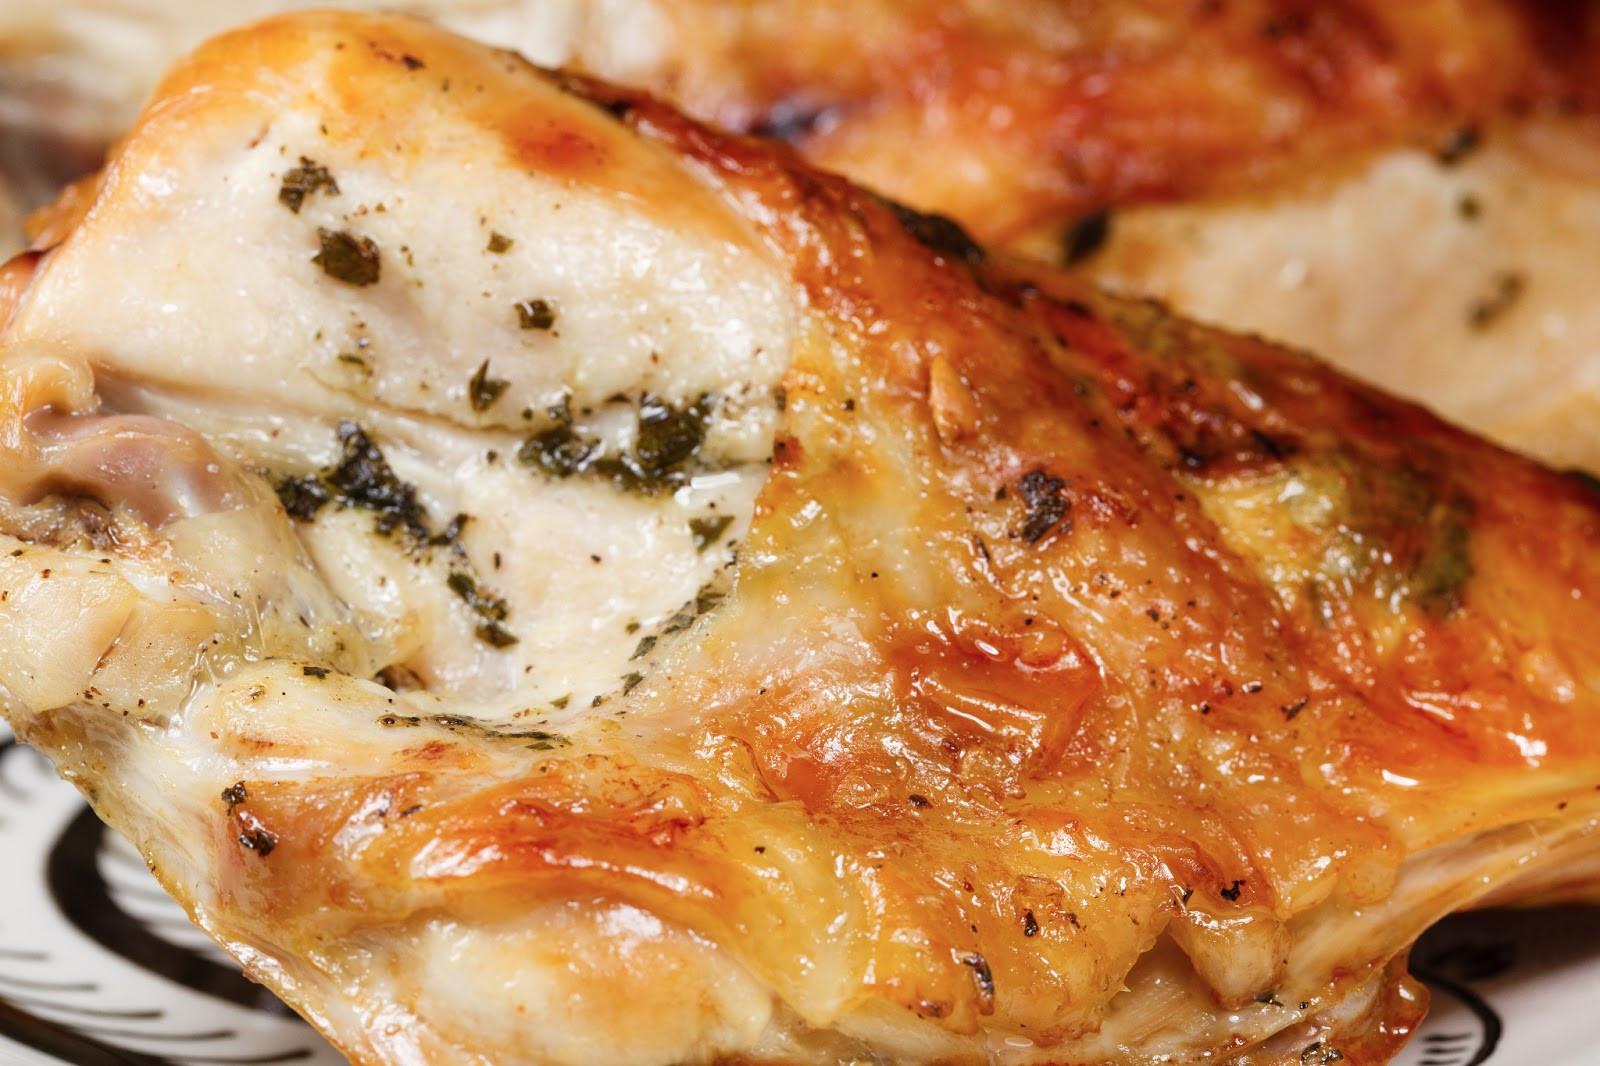 Roasted Bone In Chicken Breast  kruizing with kikukat Toaster Oven Food Roast Chicken